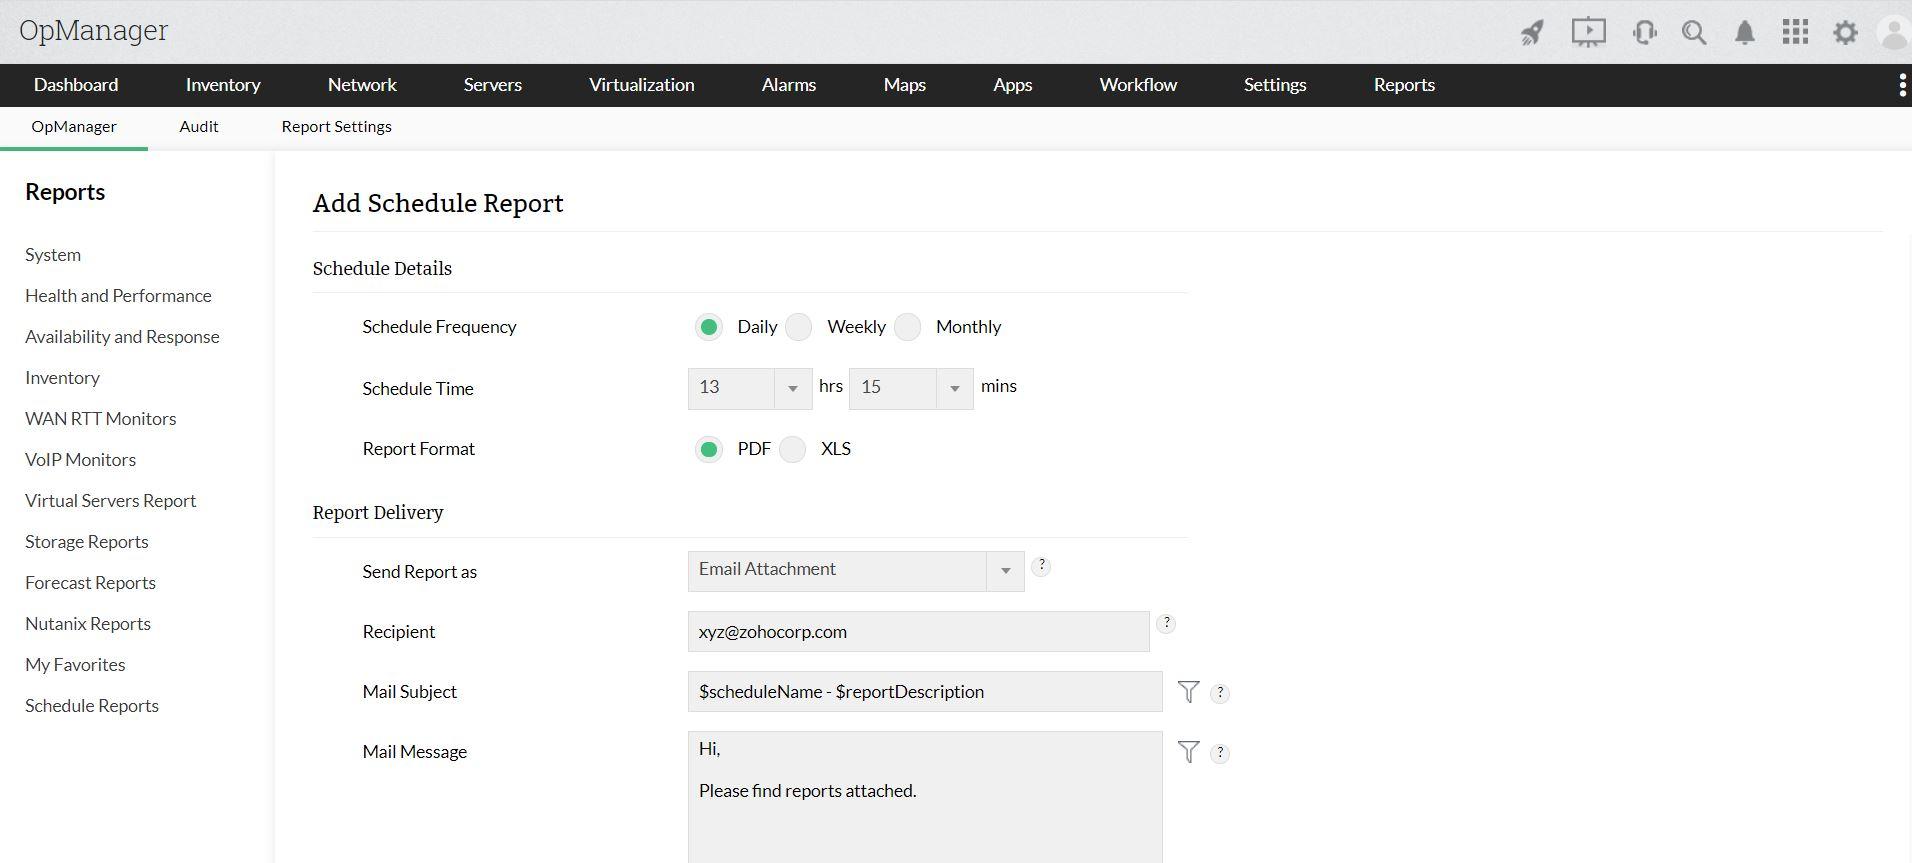 Network report schedules